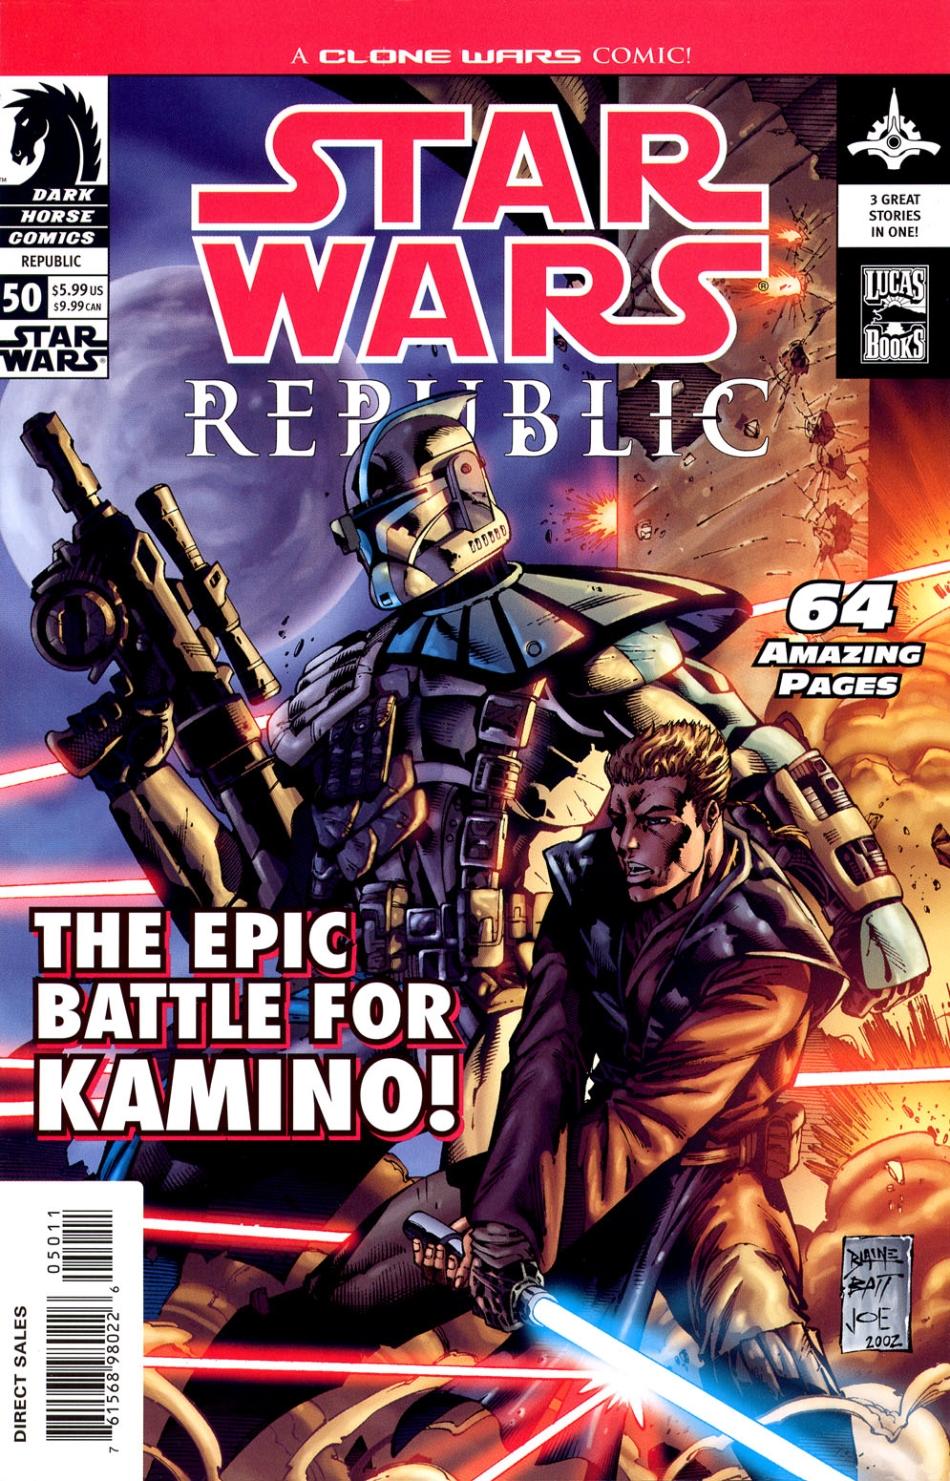 Republic #50: The Defense of Kamino (26.02.2003)